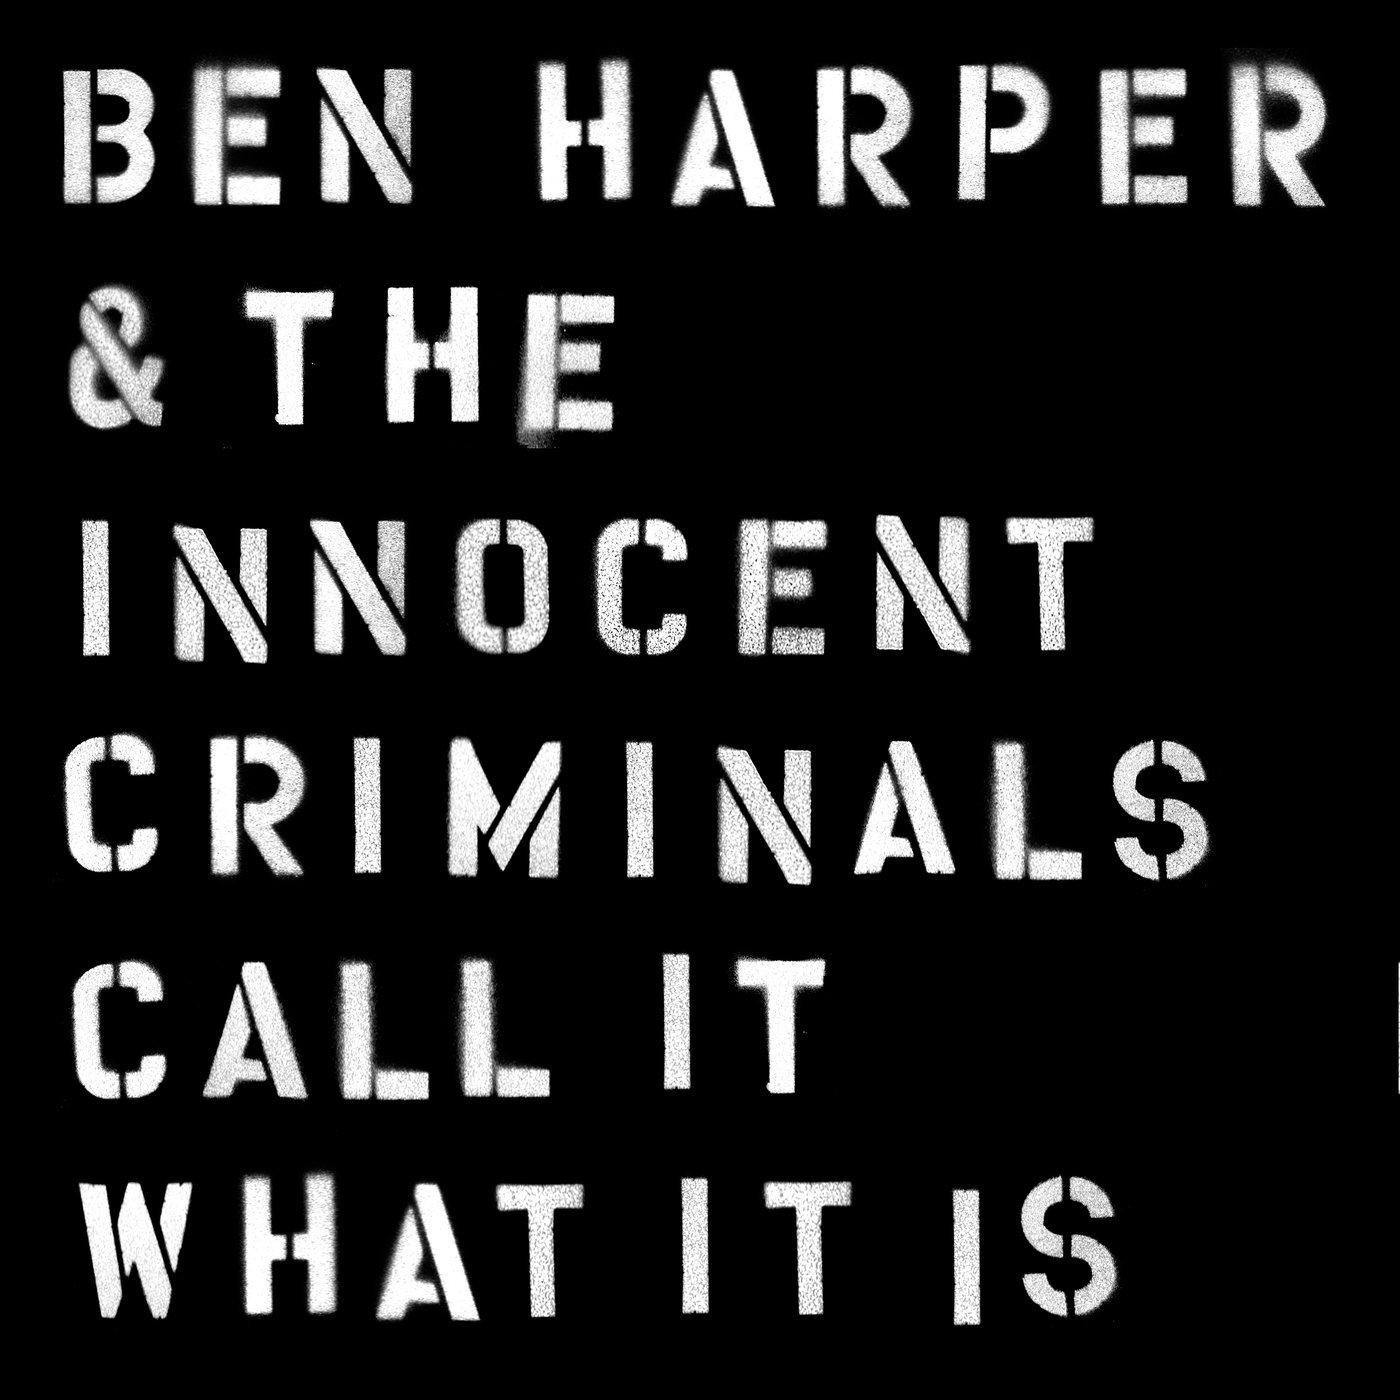 BEN HARPER – Call it what itis